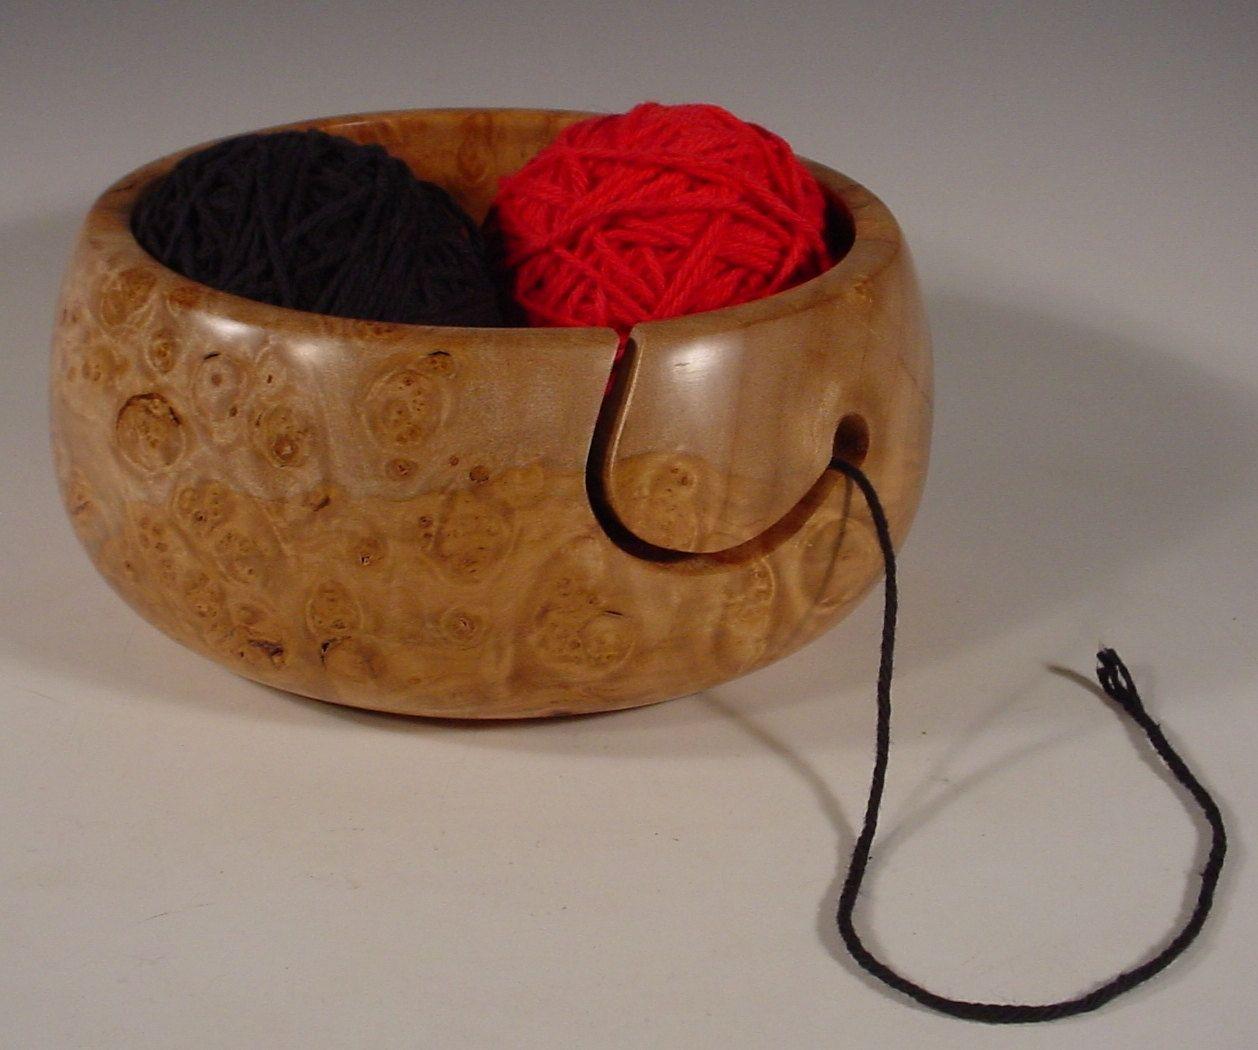 Big leaf maple burl wooden yarn bowl turned wood bowl art number big leaf maple burl wooden yarn bowl turned wood bowl art number 6037 by nelsonwood on reviewsmspy